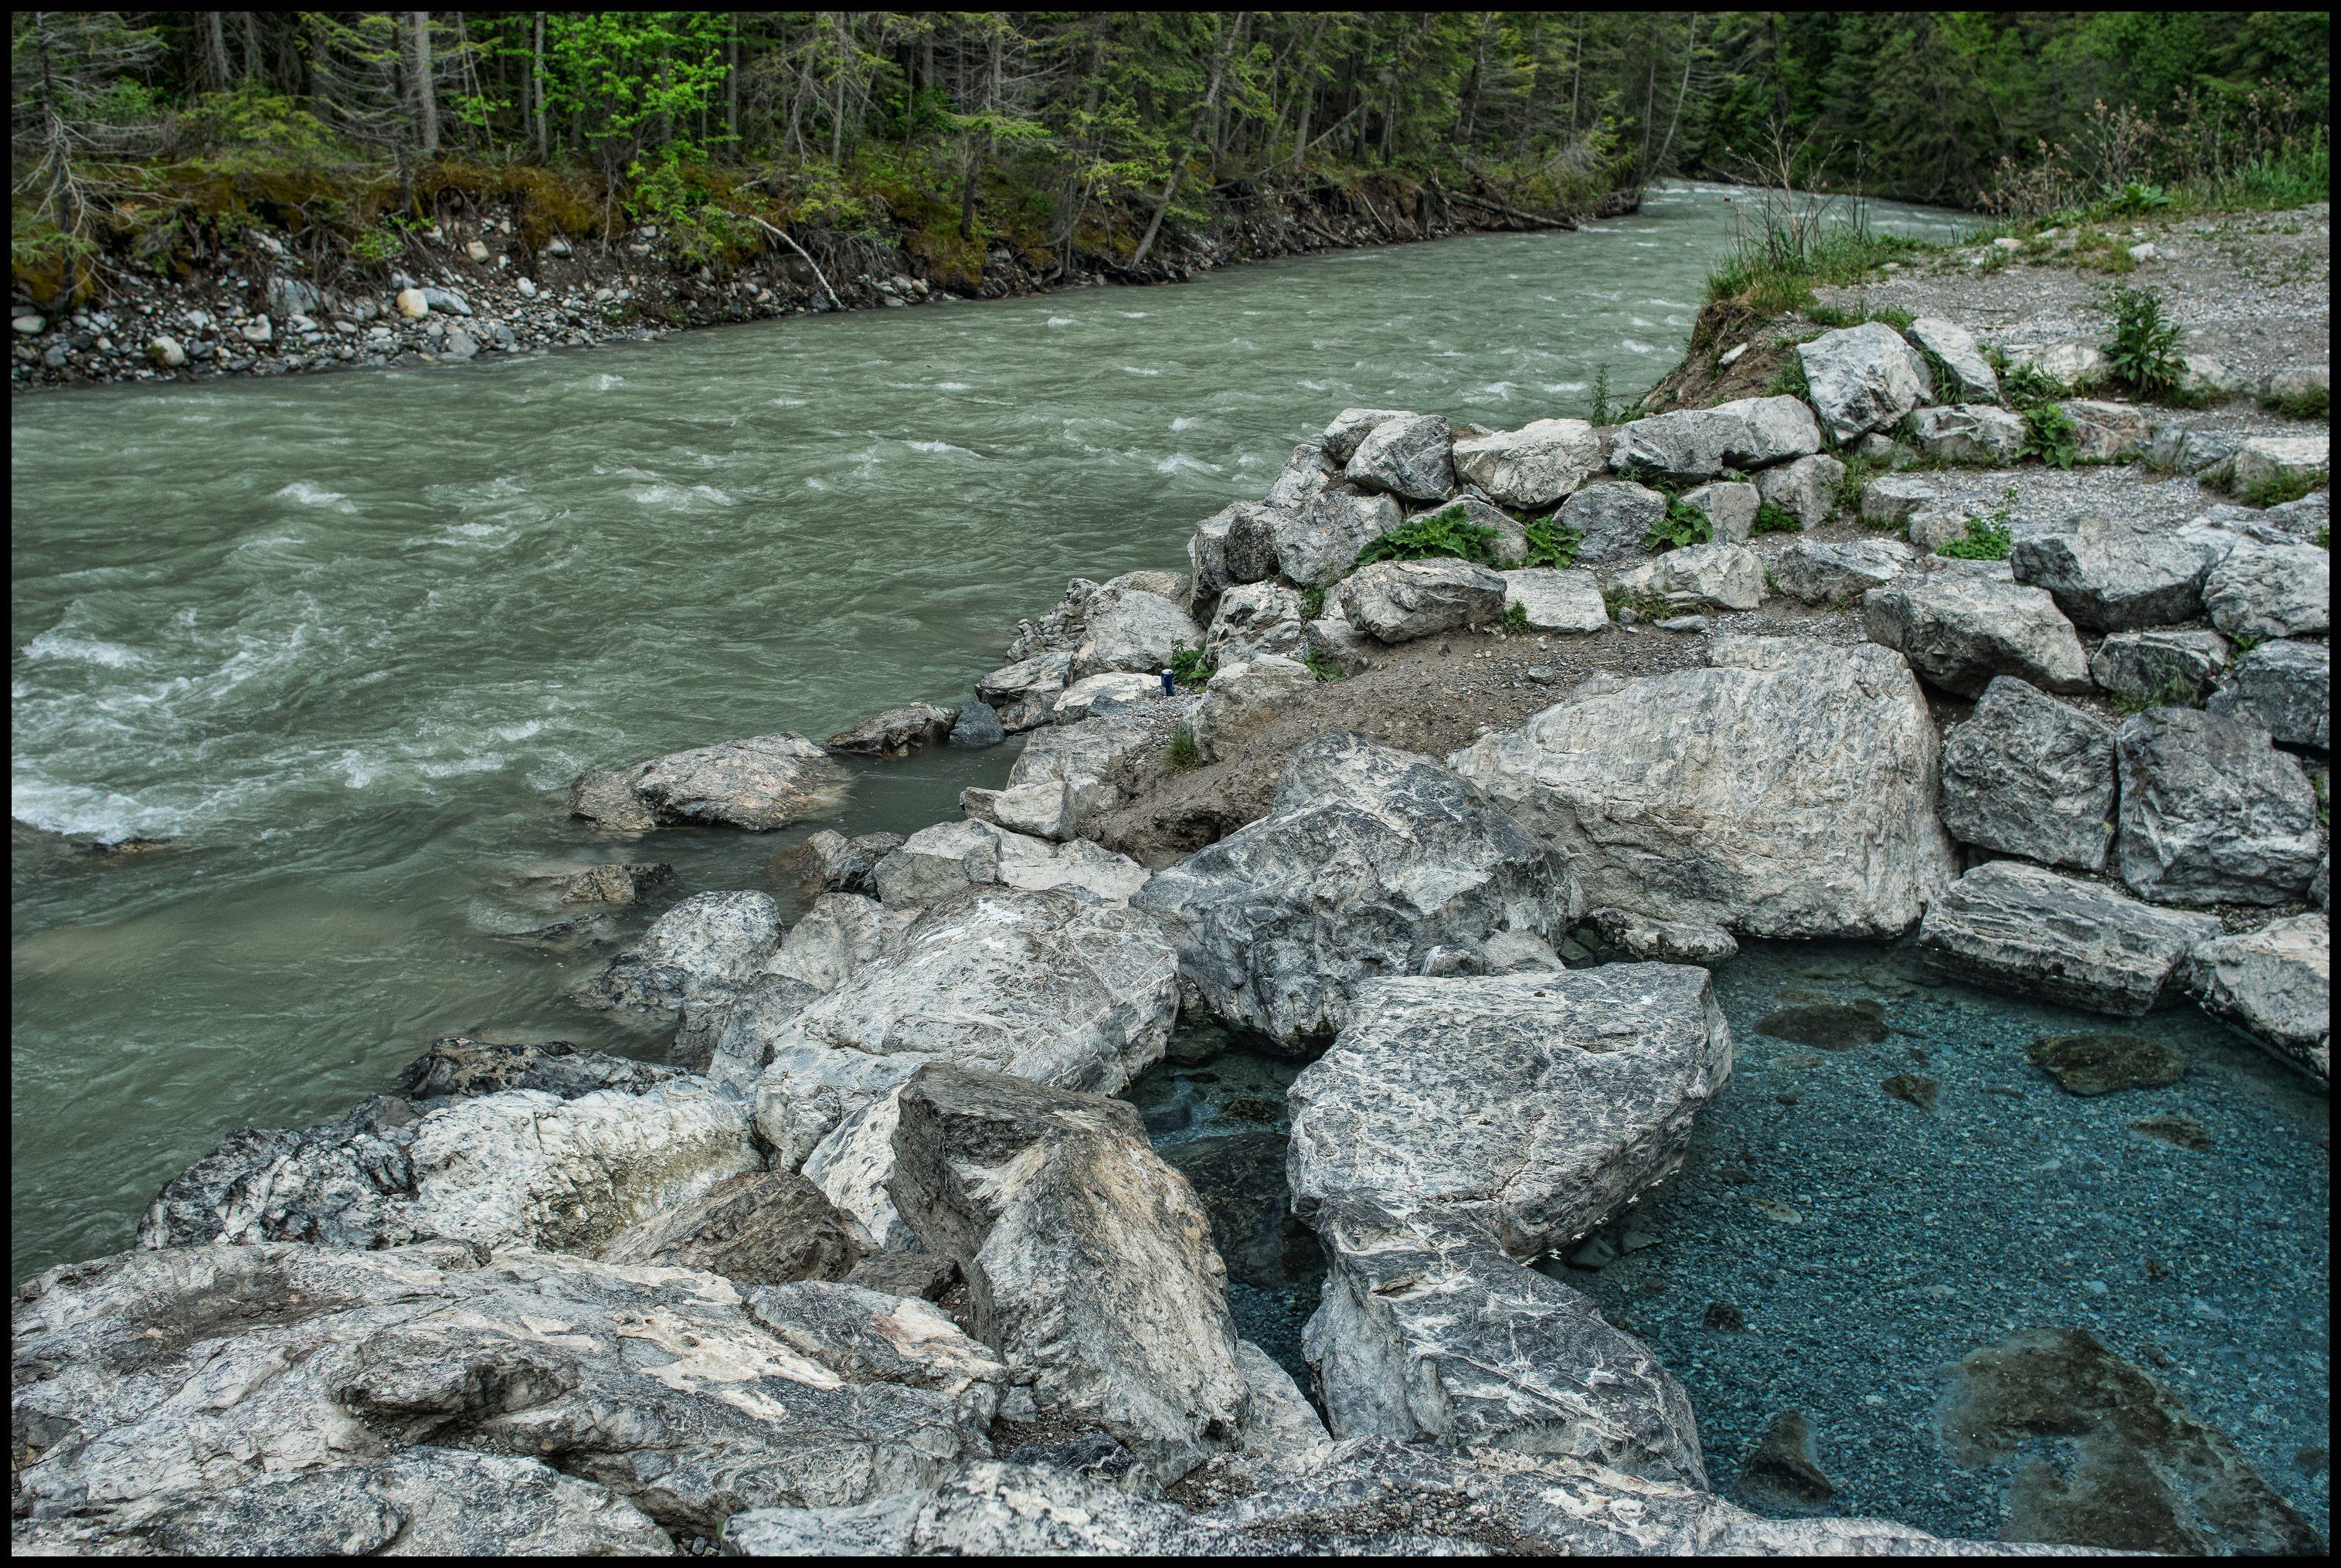 Lussier natural Hot Springs pool Sony A7 / Canon FD Tilt Shift 35 2.8